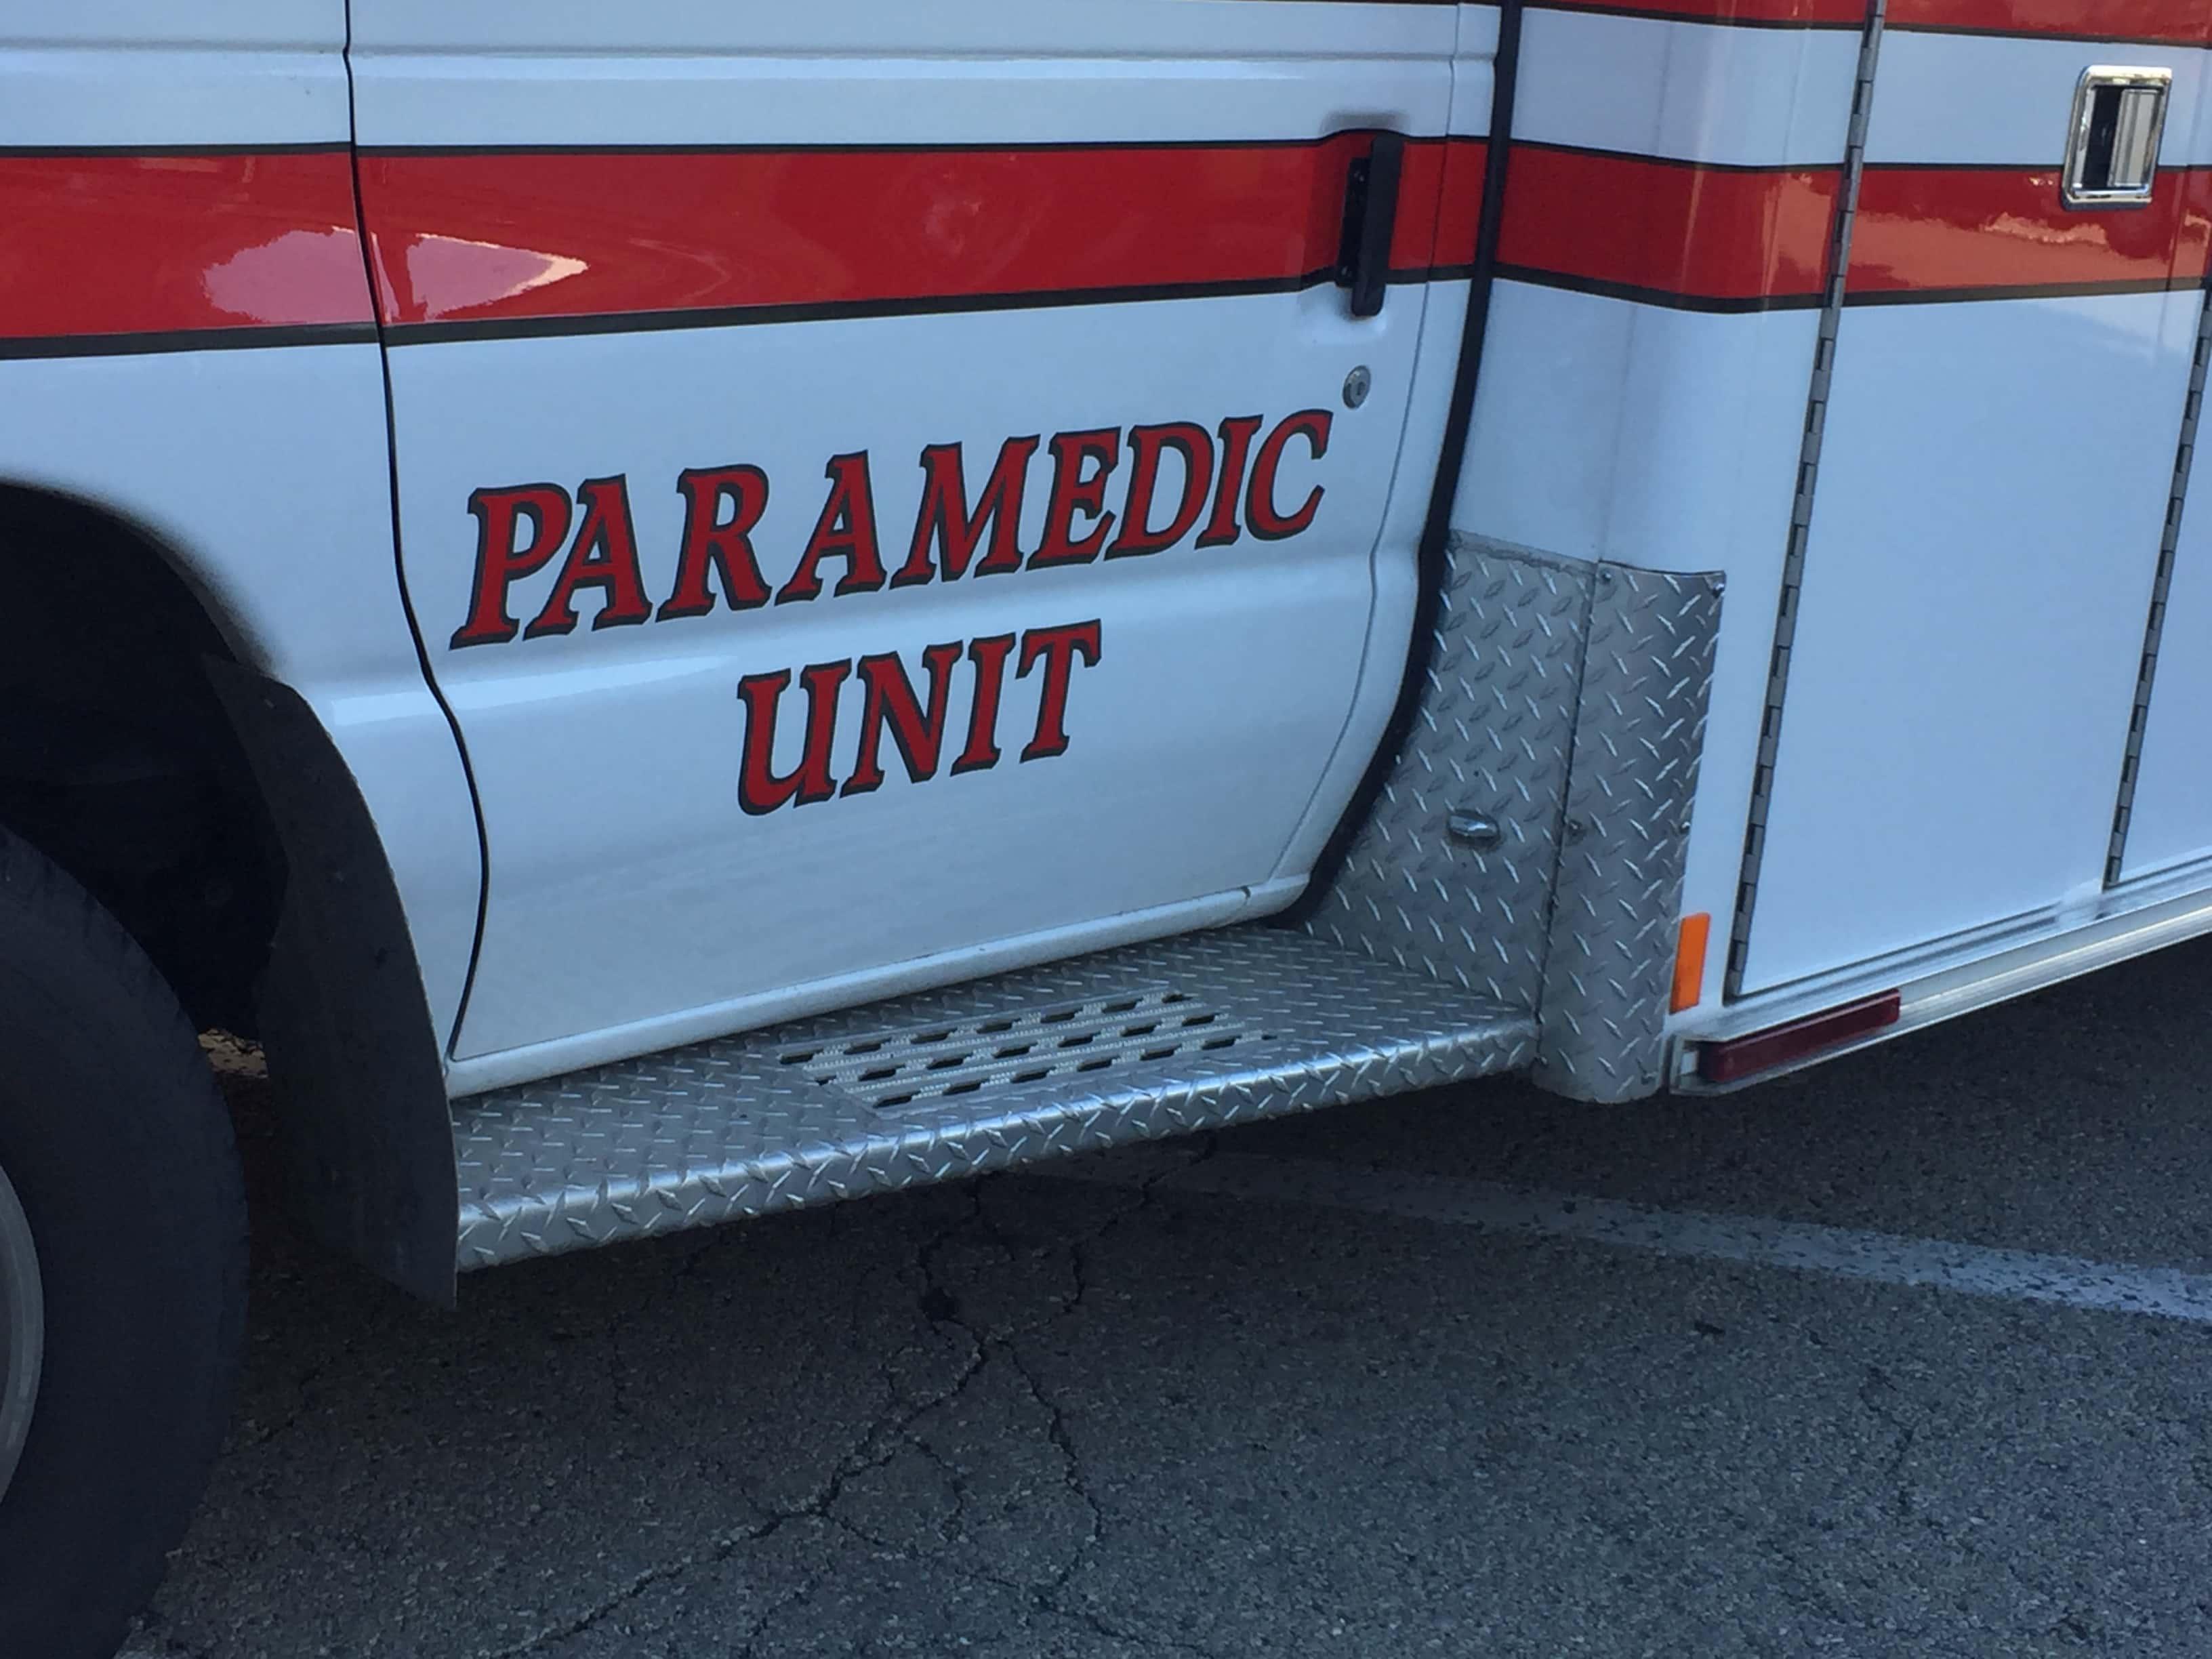 Ambulance Rescue Paramedics Paramedic nurse doctor emergency studstill media